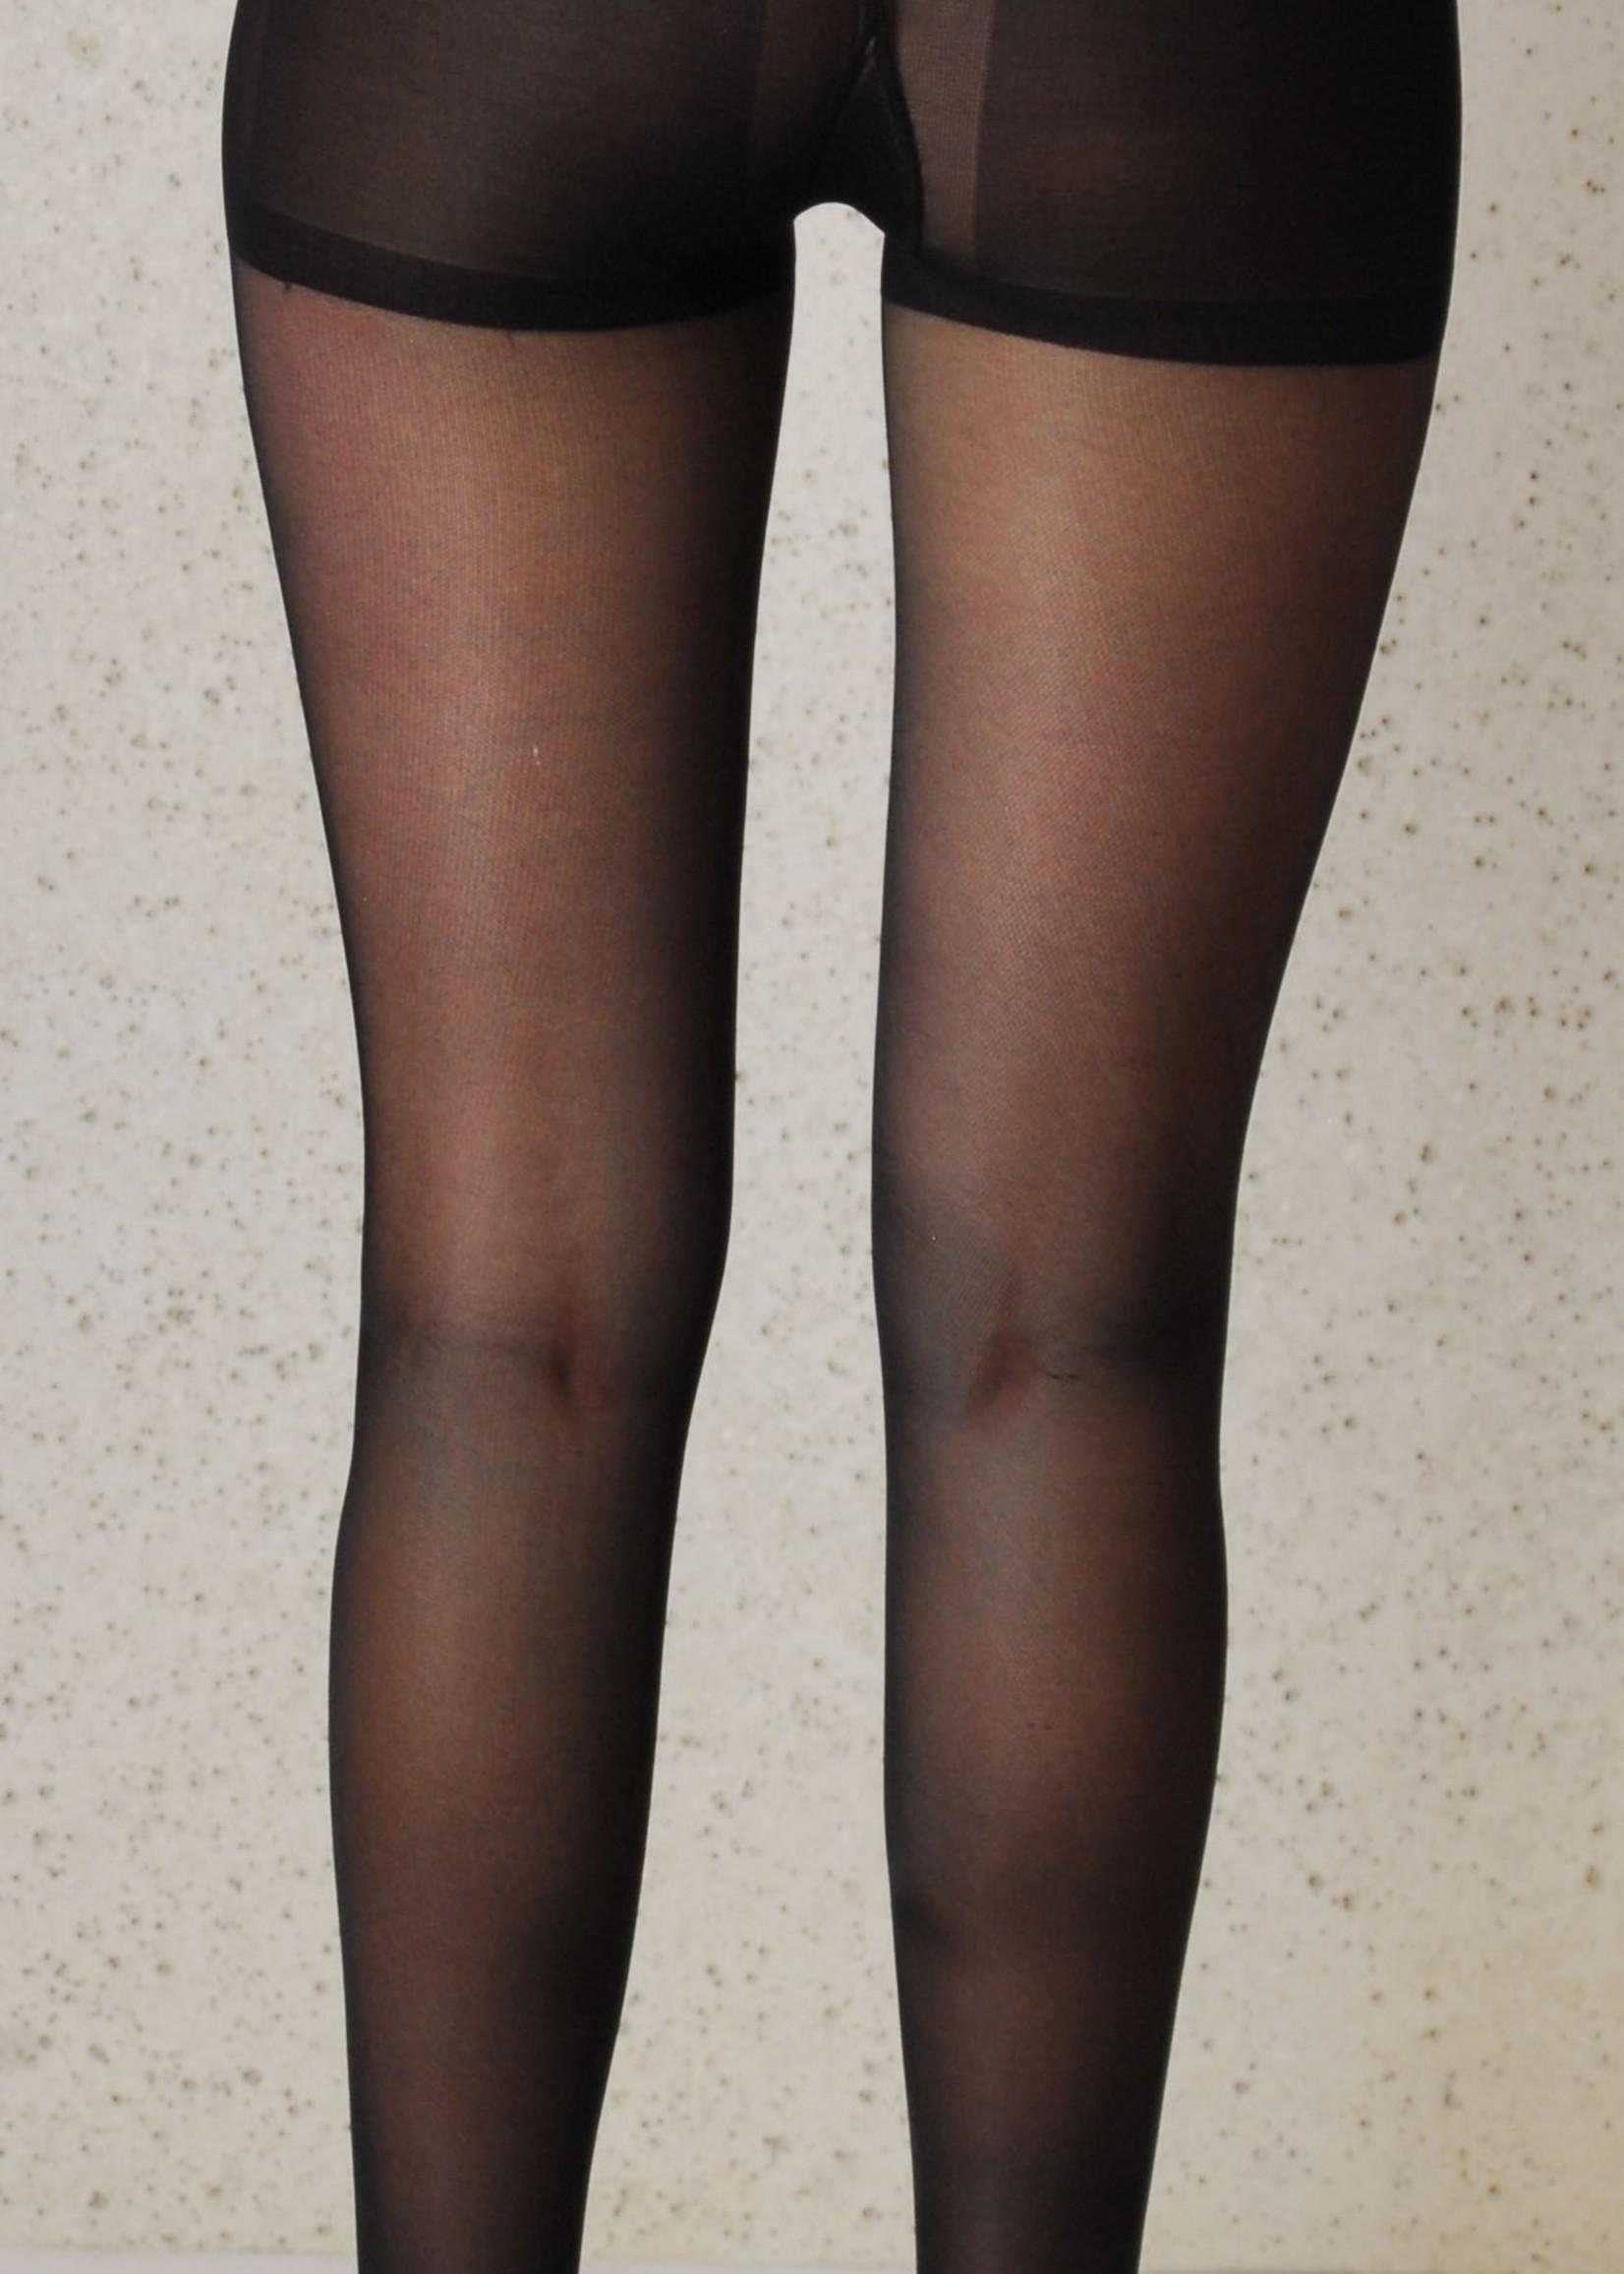 Segretta Segretta 140 Young  Sheer Panty sterke Compressie met Shape Up broekje - Zwart